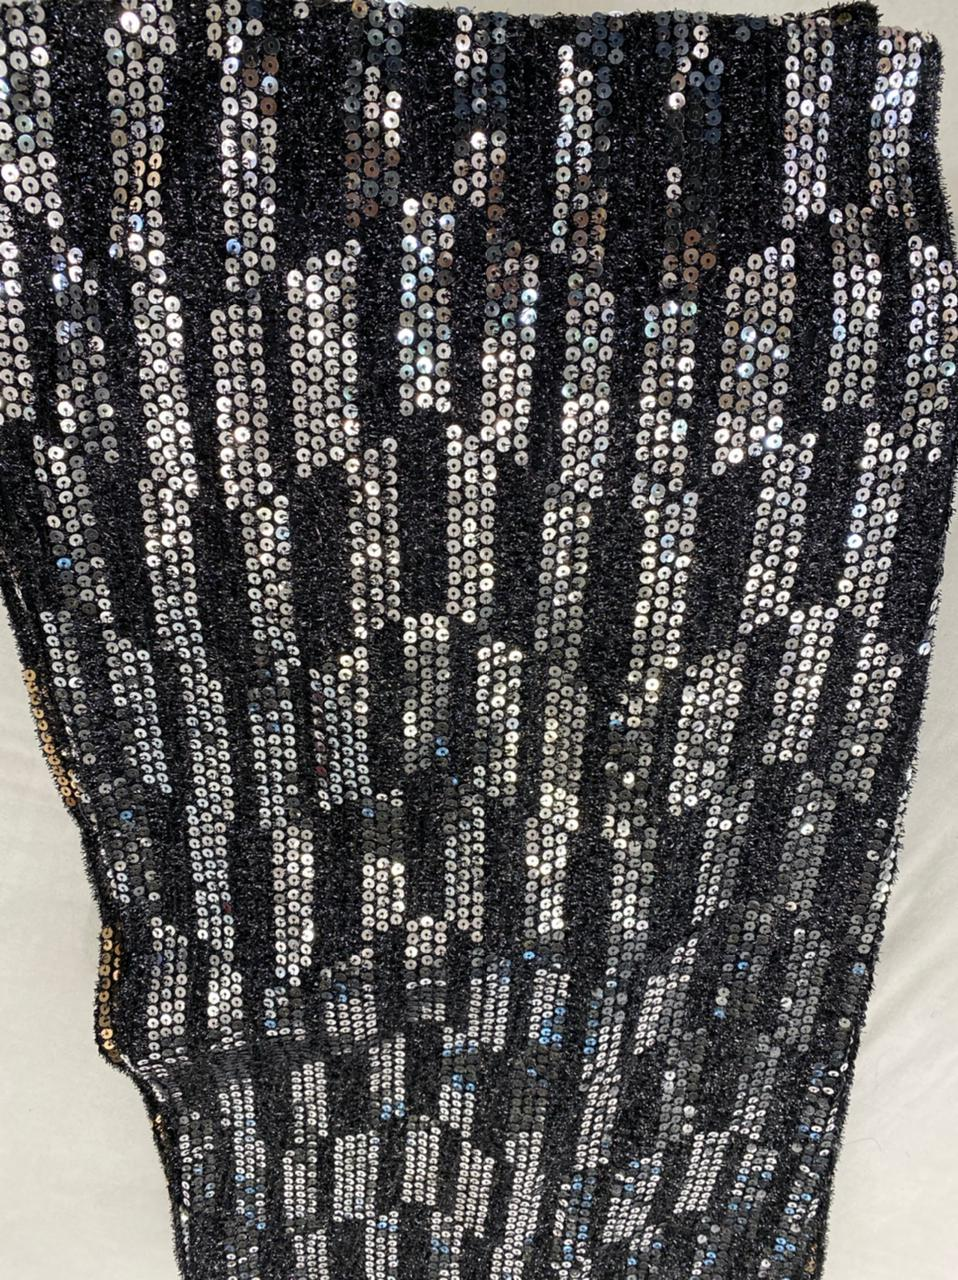 Imported Glitter Lycra